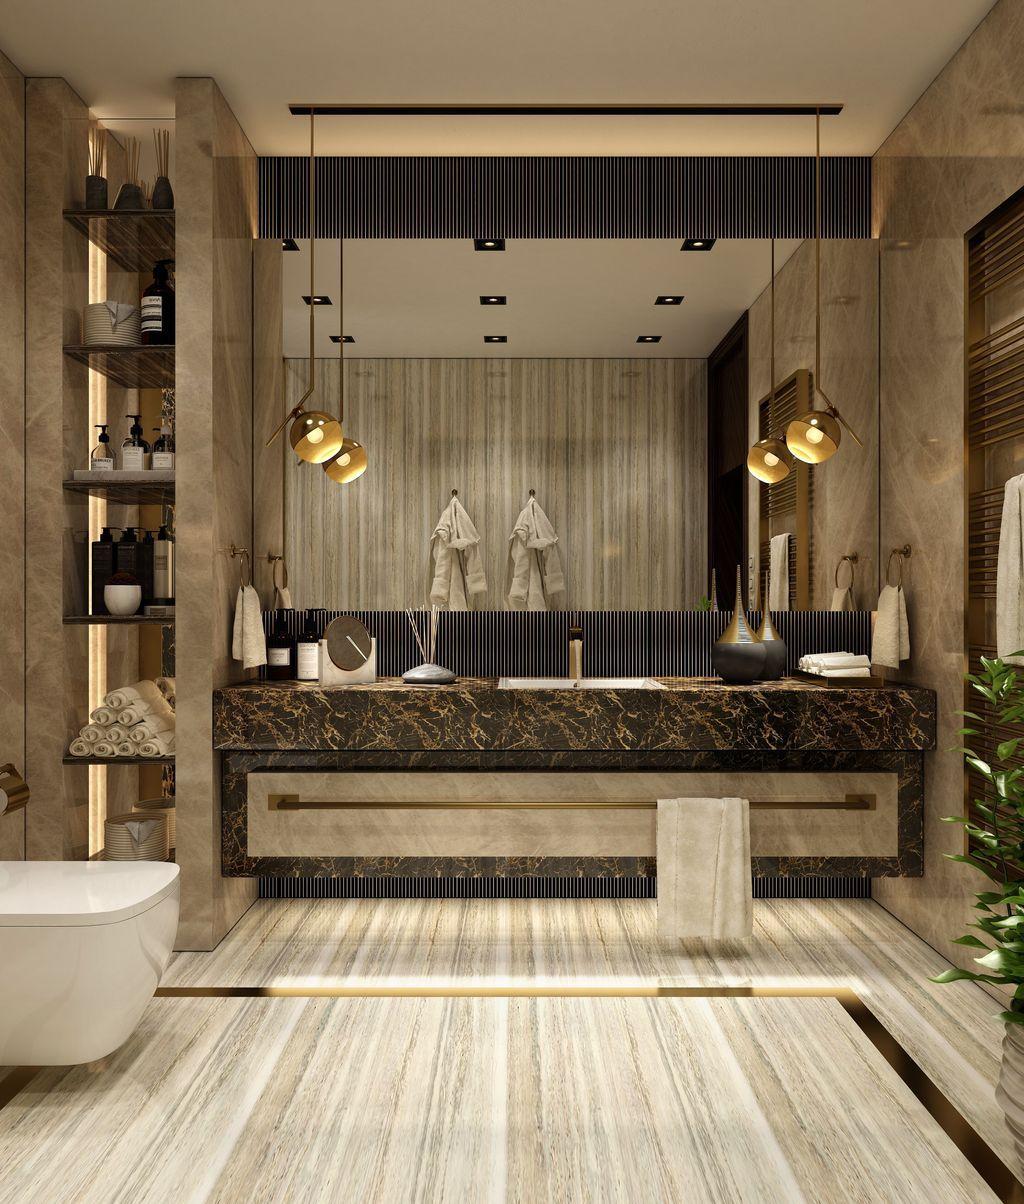 35 Luxury Bathroom Design And Decor Ideas Magzhouse Modern Luxury Bathroom Bathroom Inspiration Modern Bathroom Remodel Cost